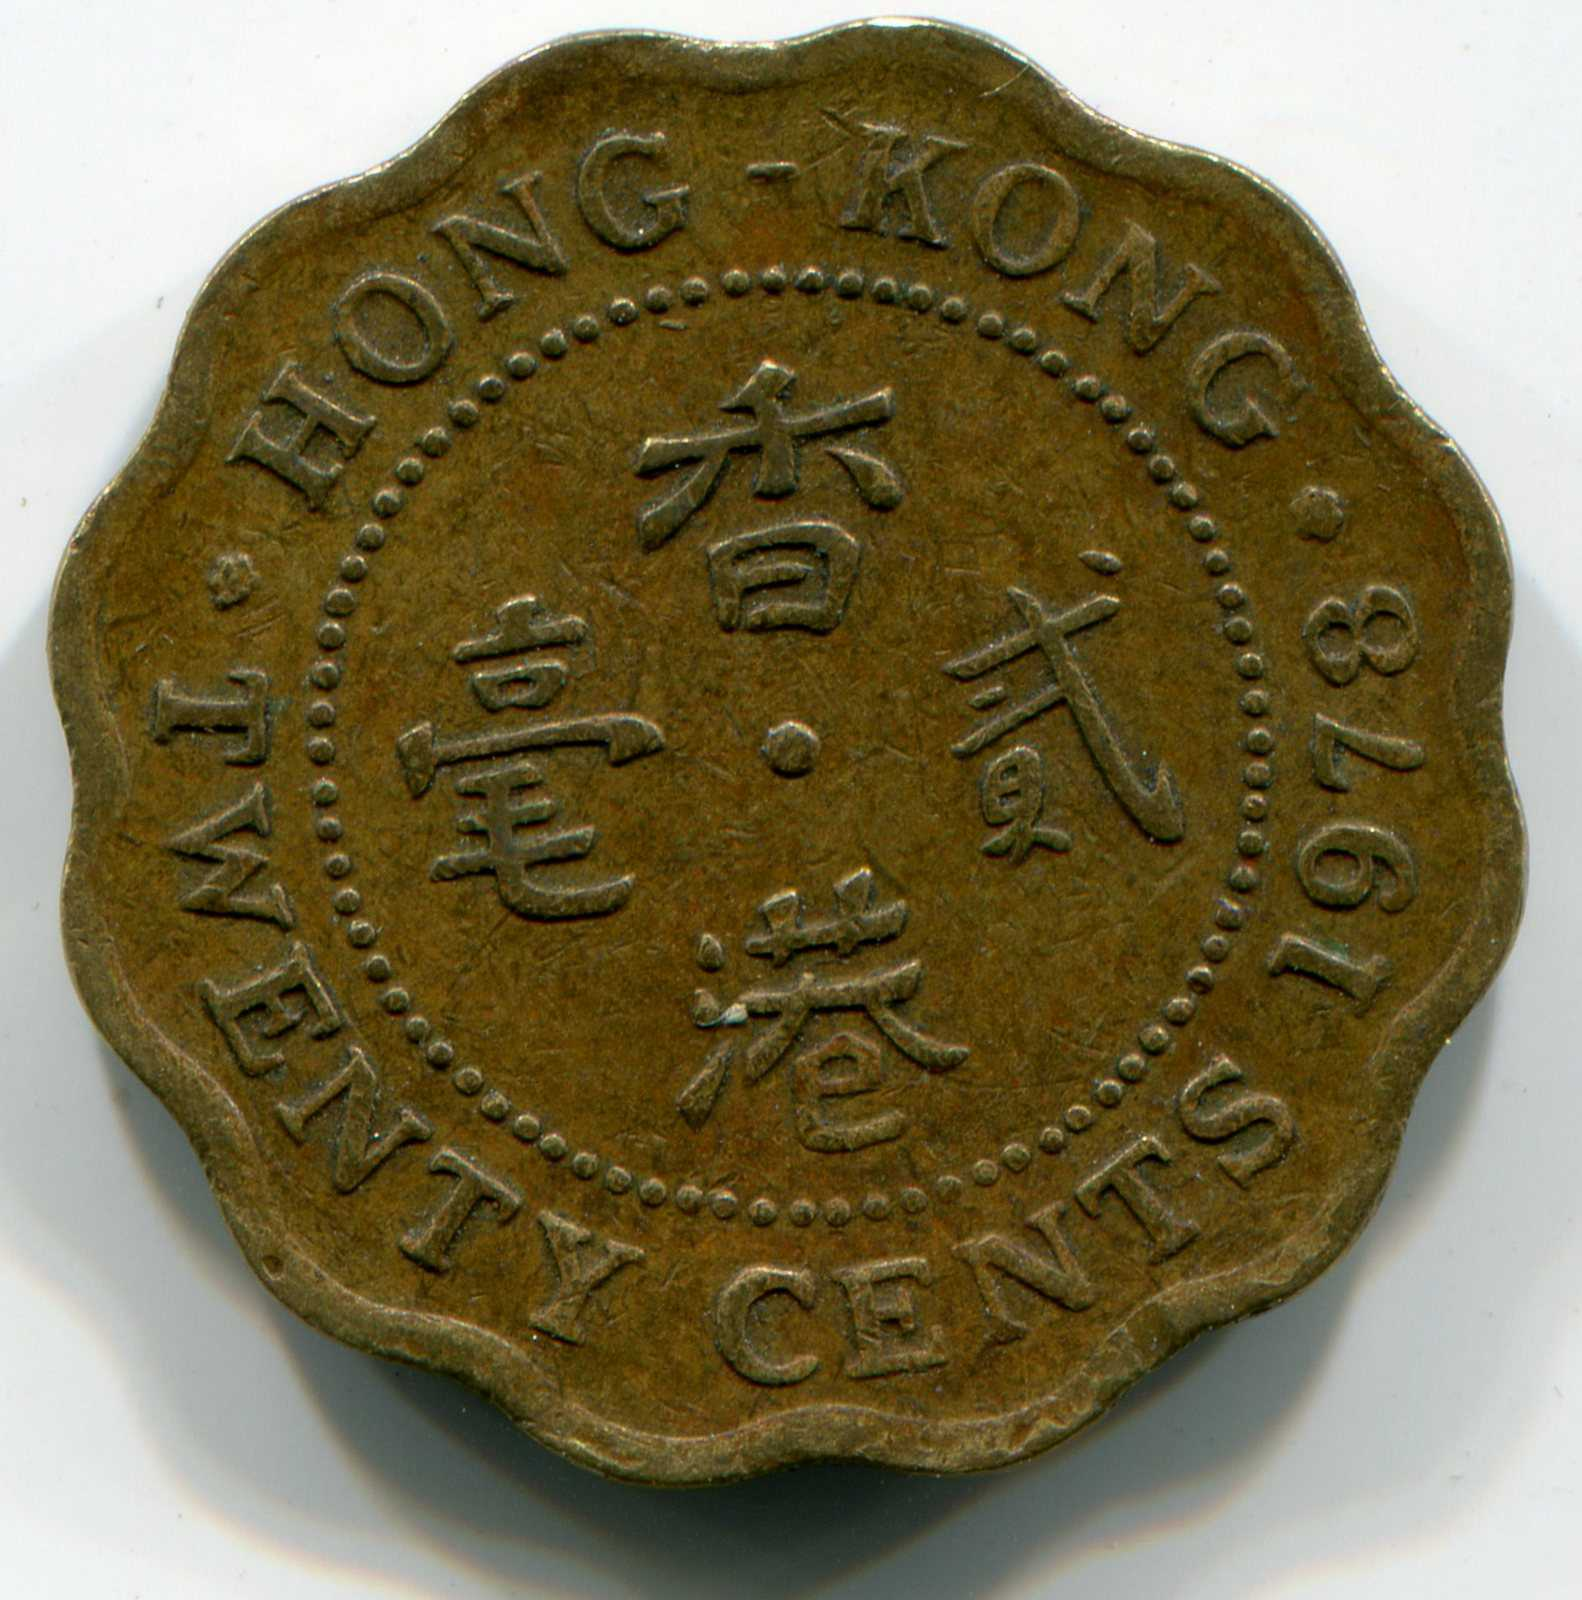 1978 queen elizabeth coin